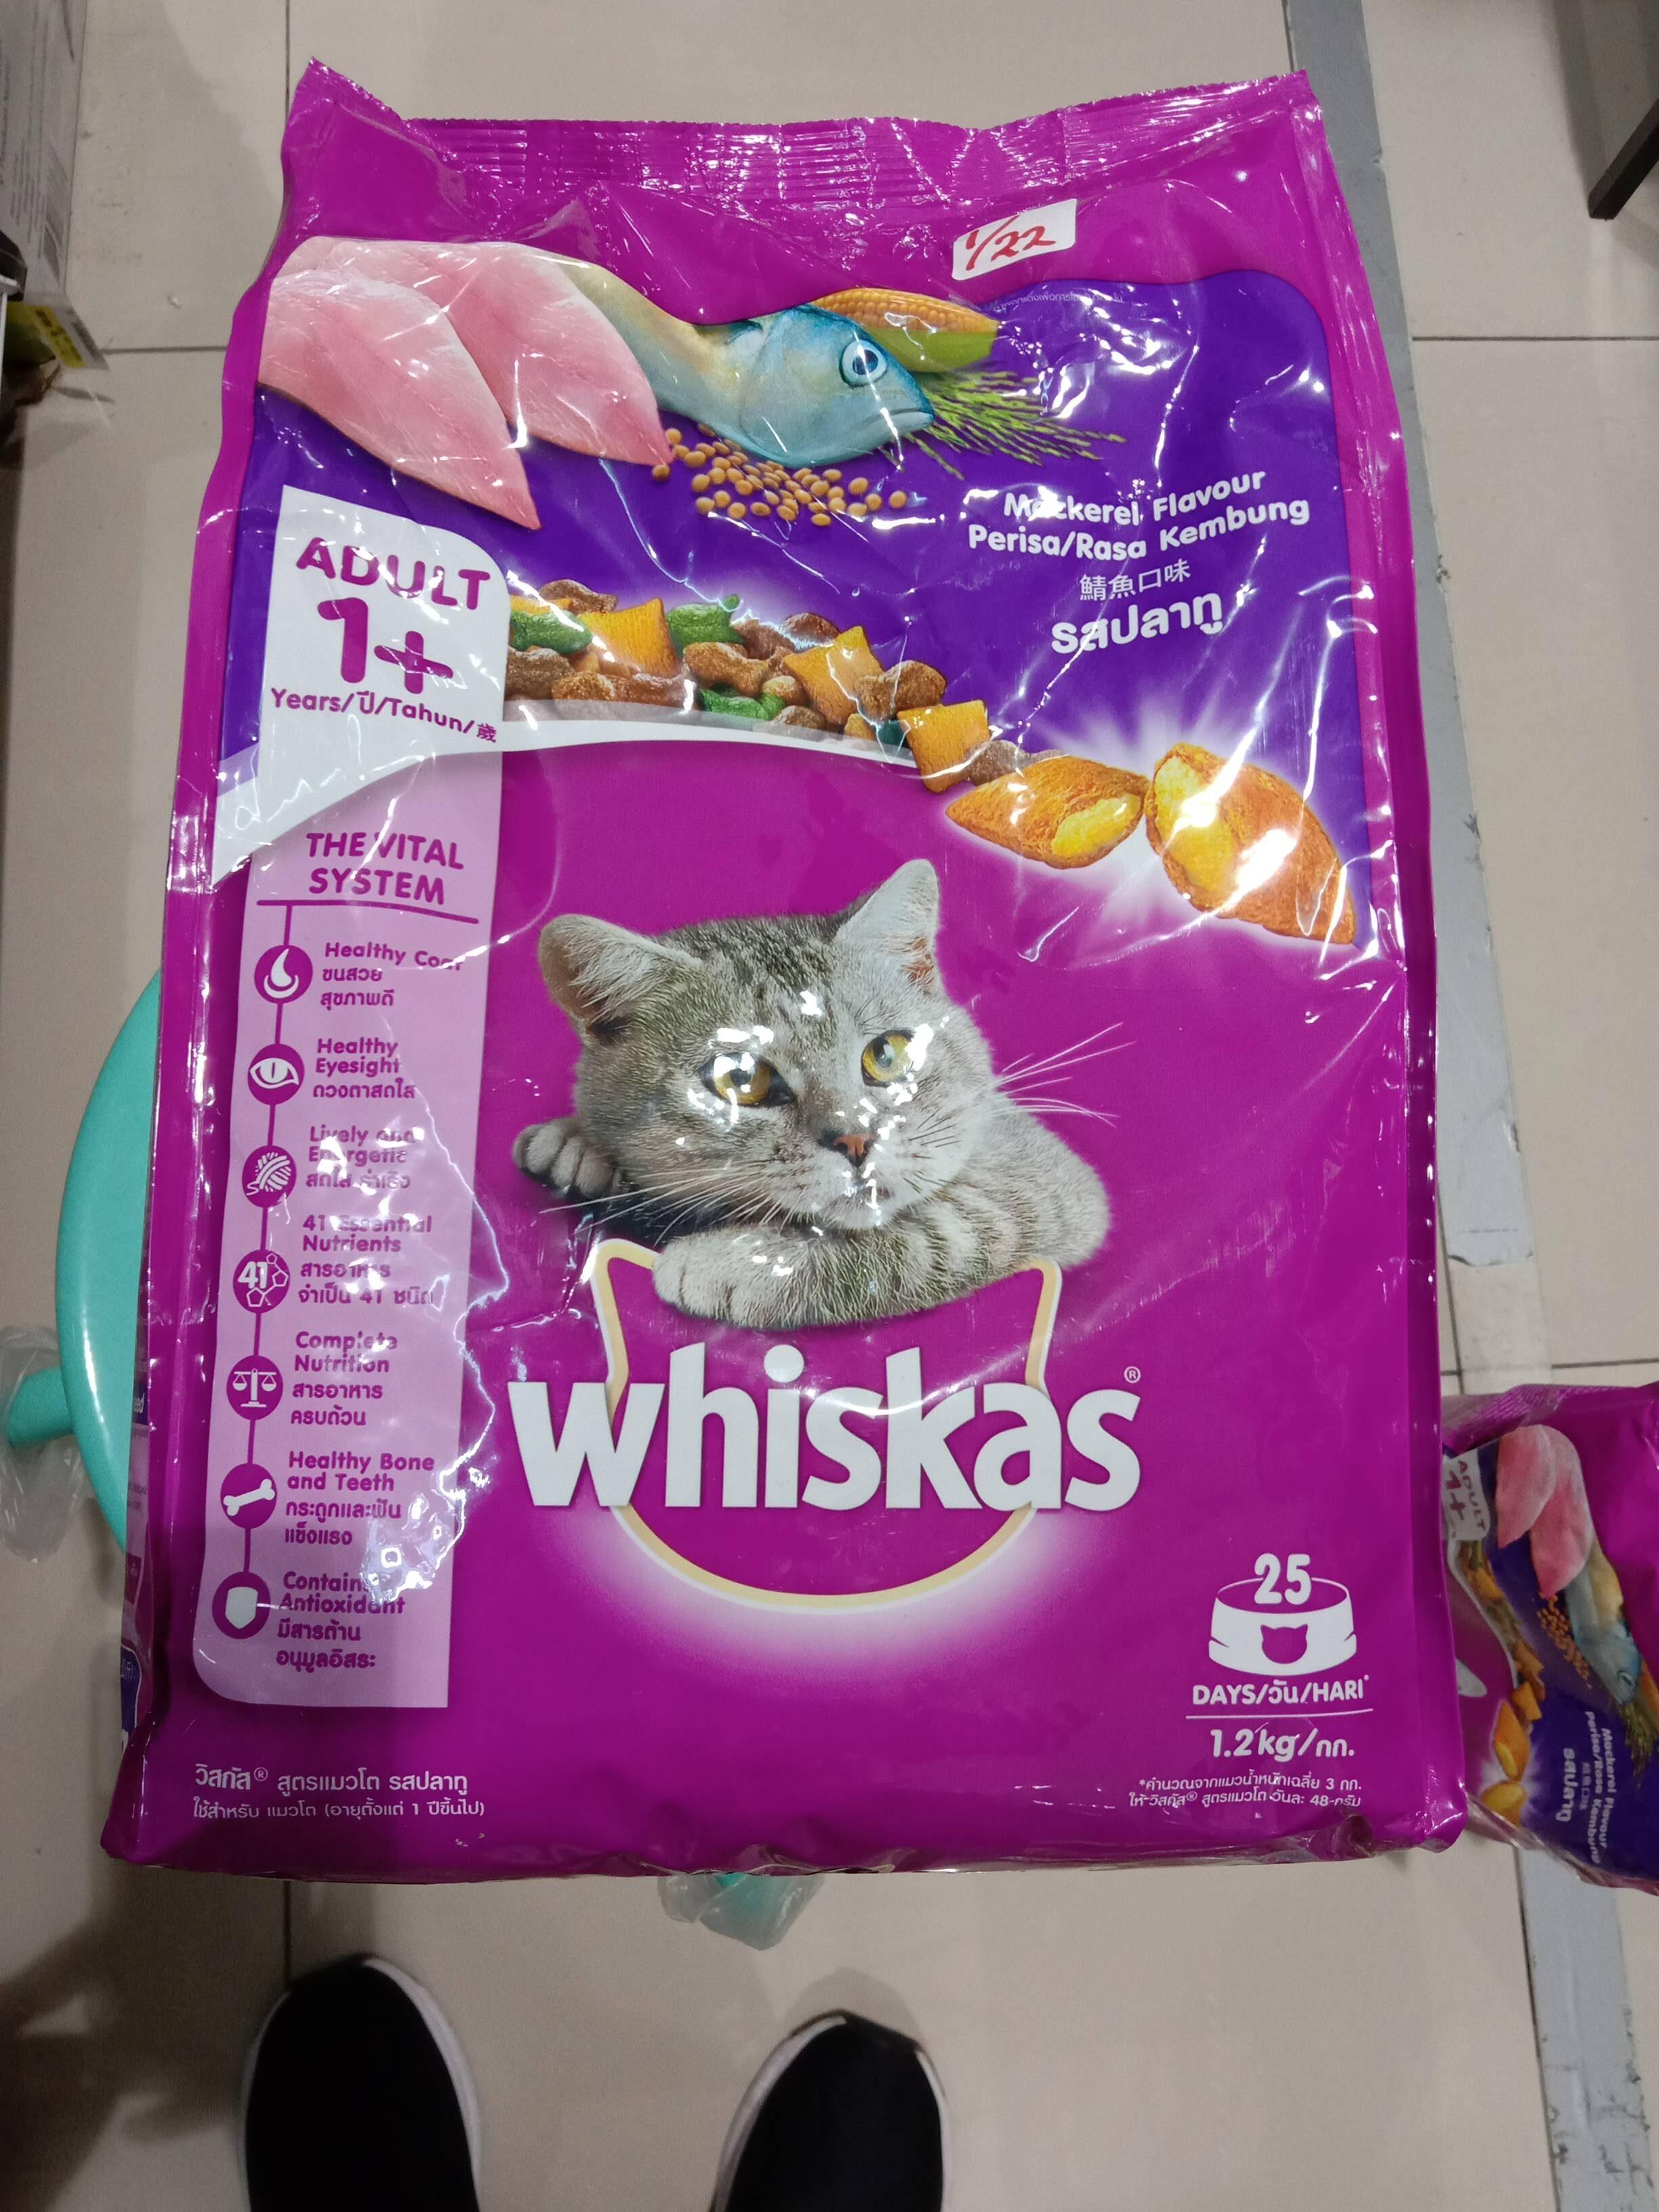 Whiskas Adult 1+ mackerel flavour 1,2kg - Produk - id